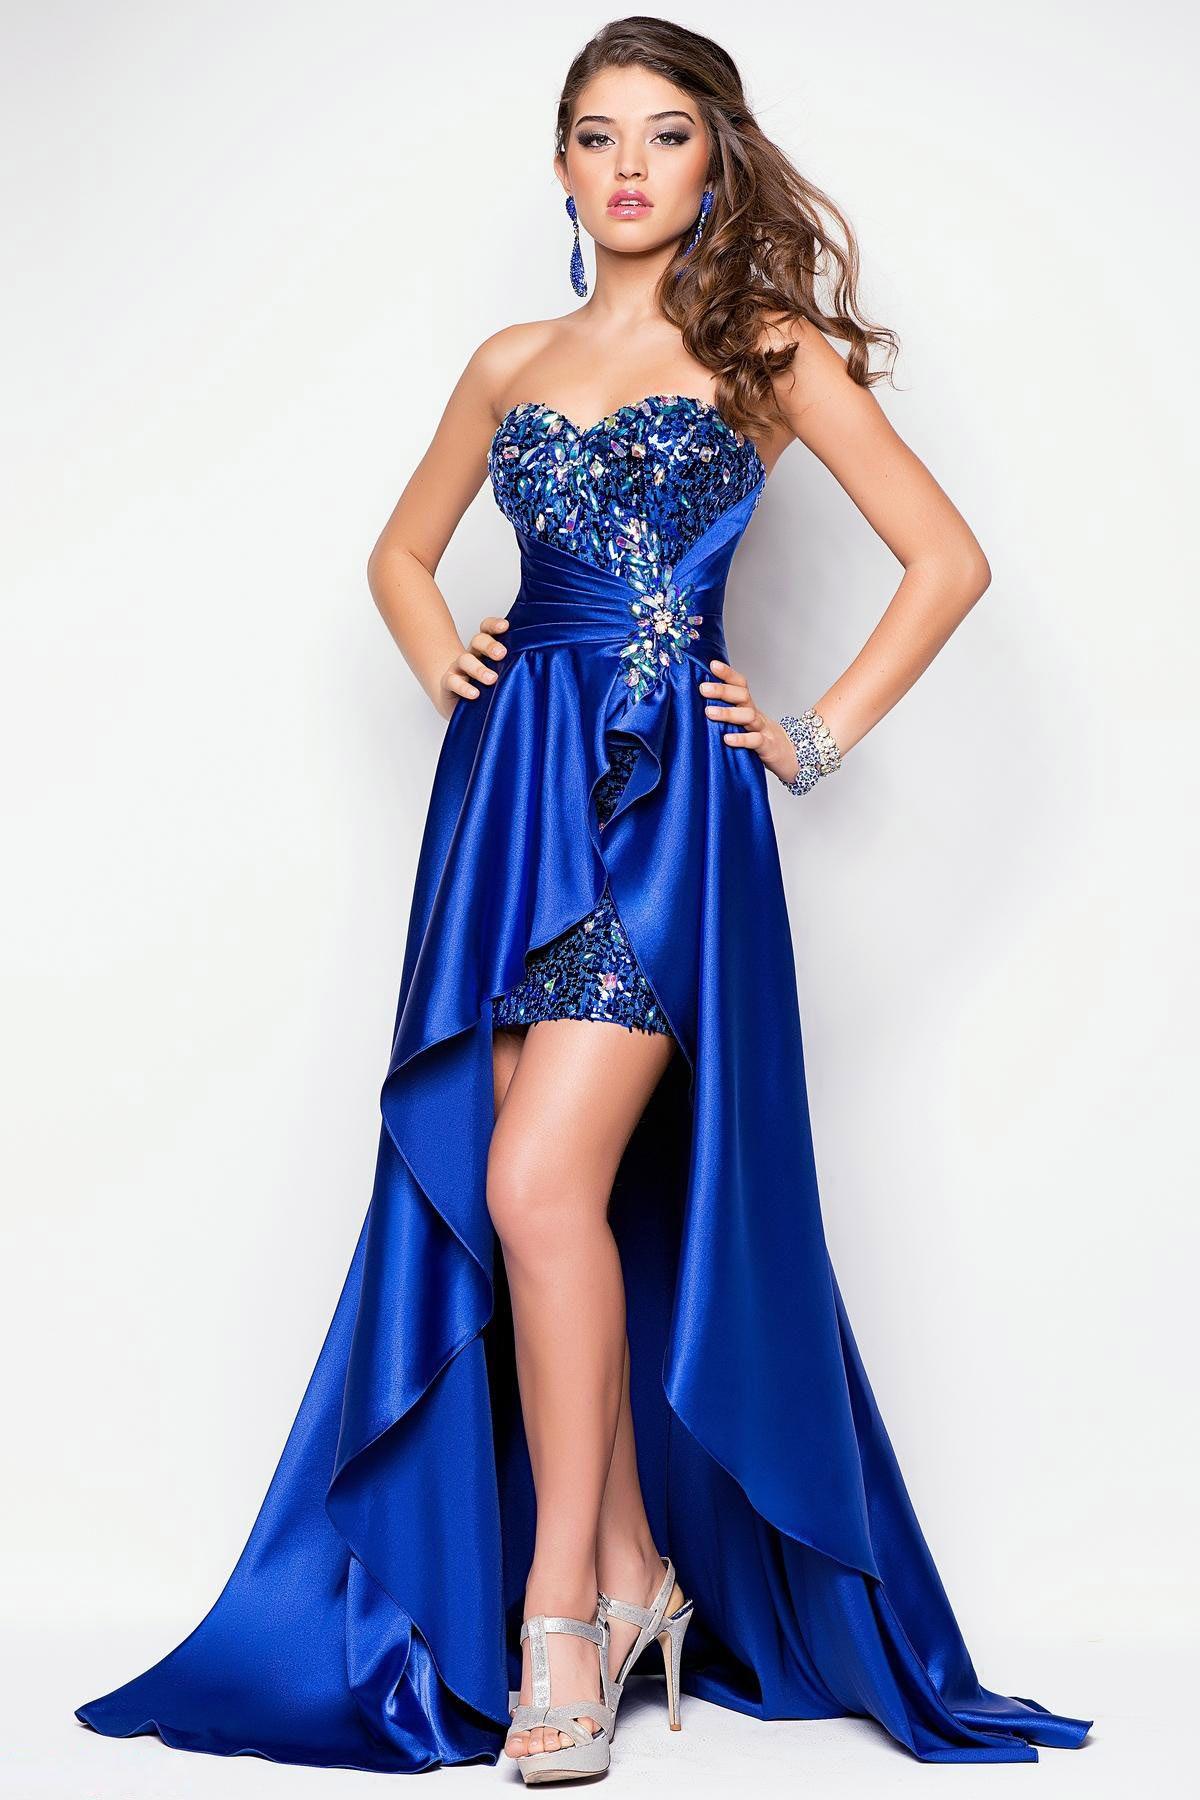 2013 Prom Dresses High Low Sweetheart Elastic Satin With Rhinestone ...